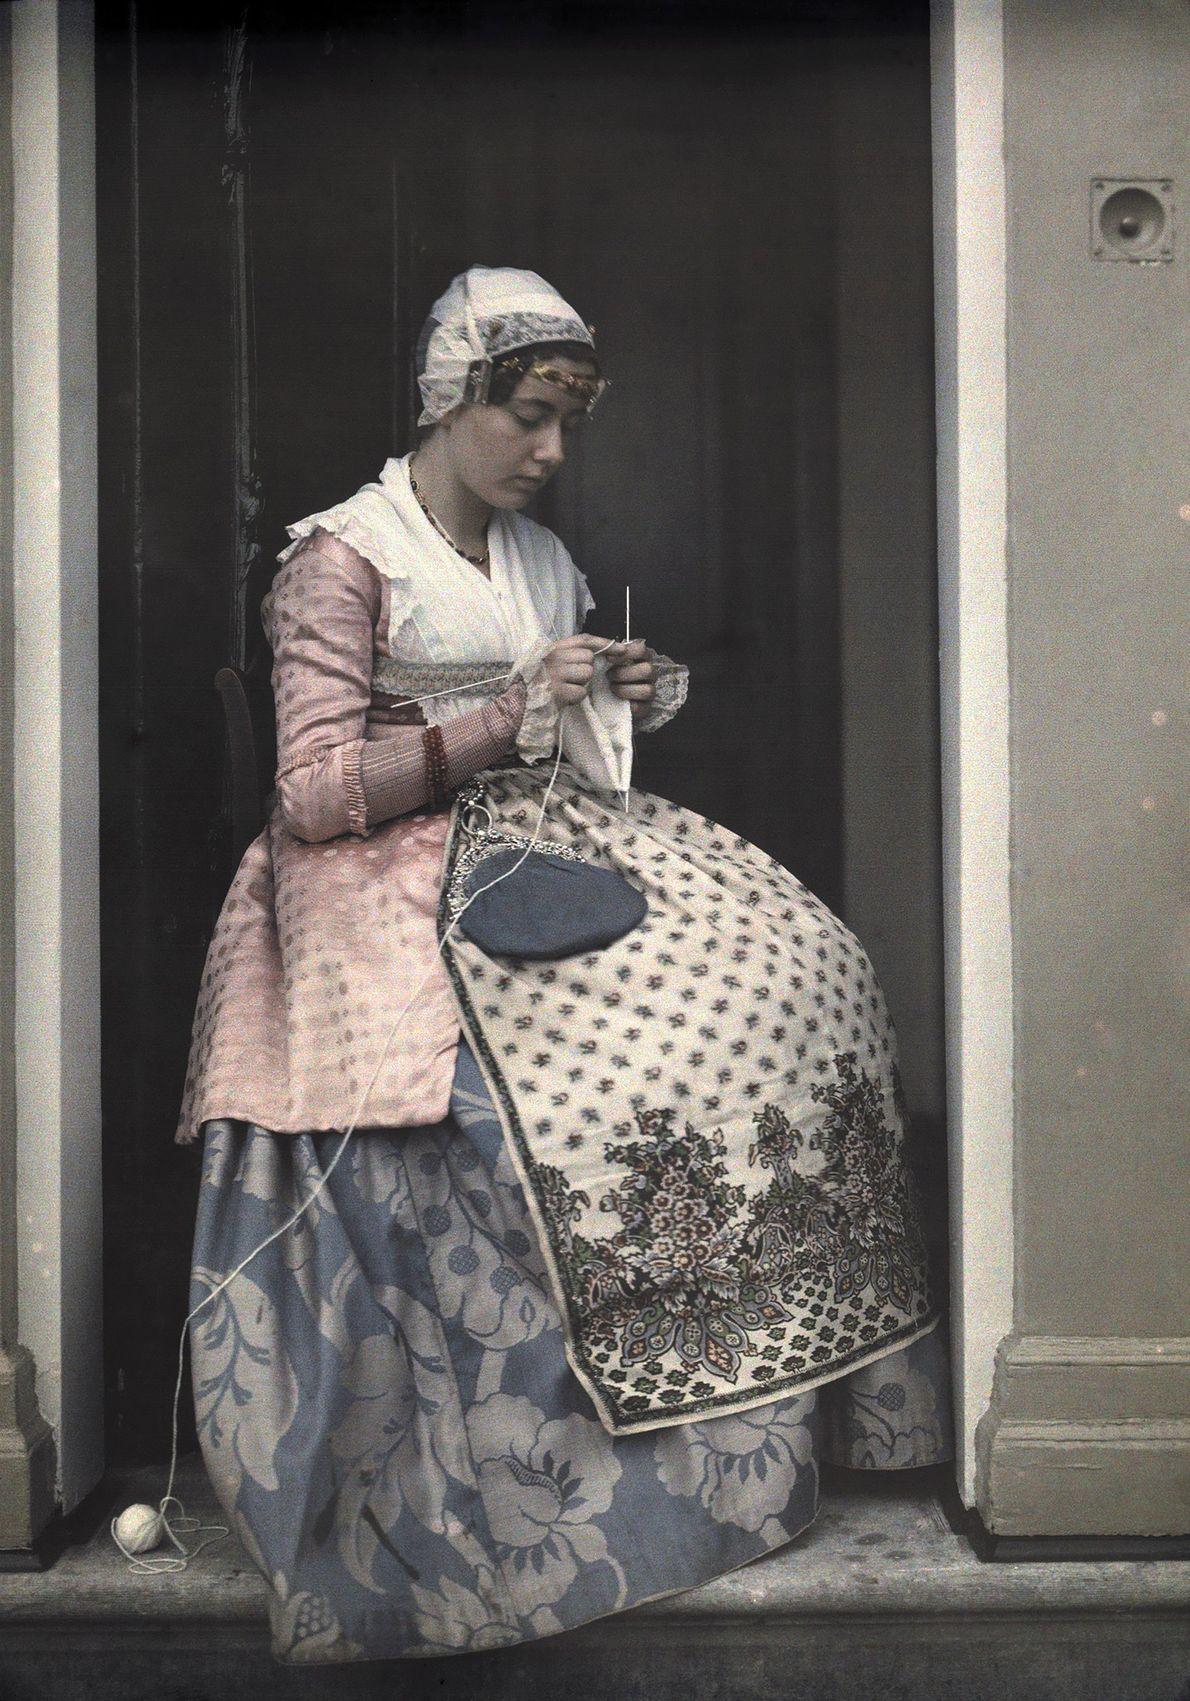 Vestido Tradicional - Fotografias Autocromo